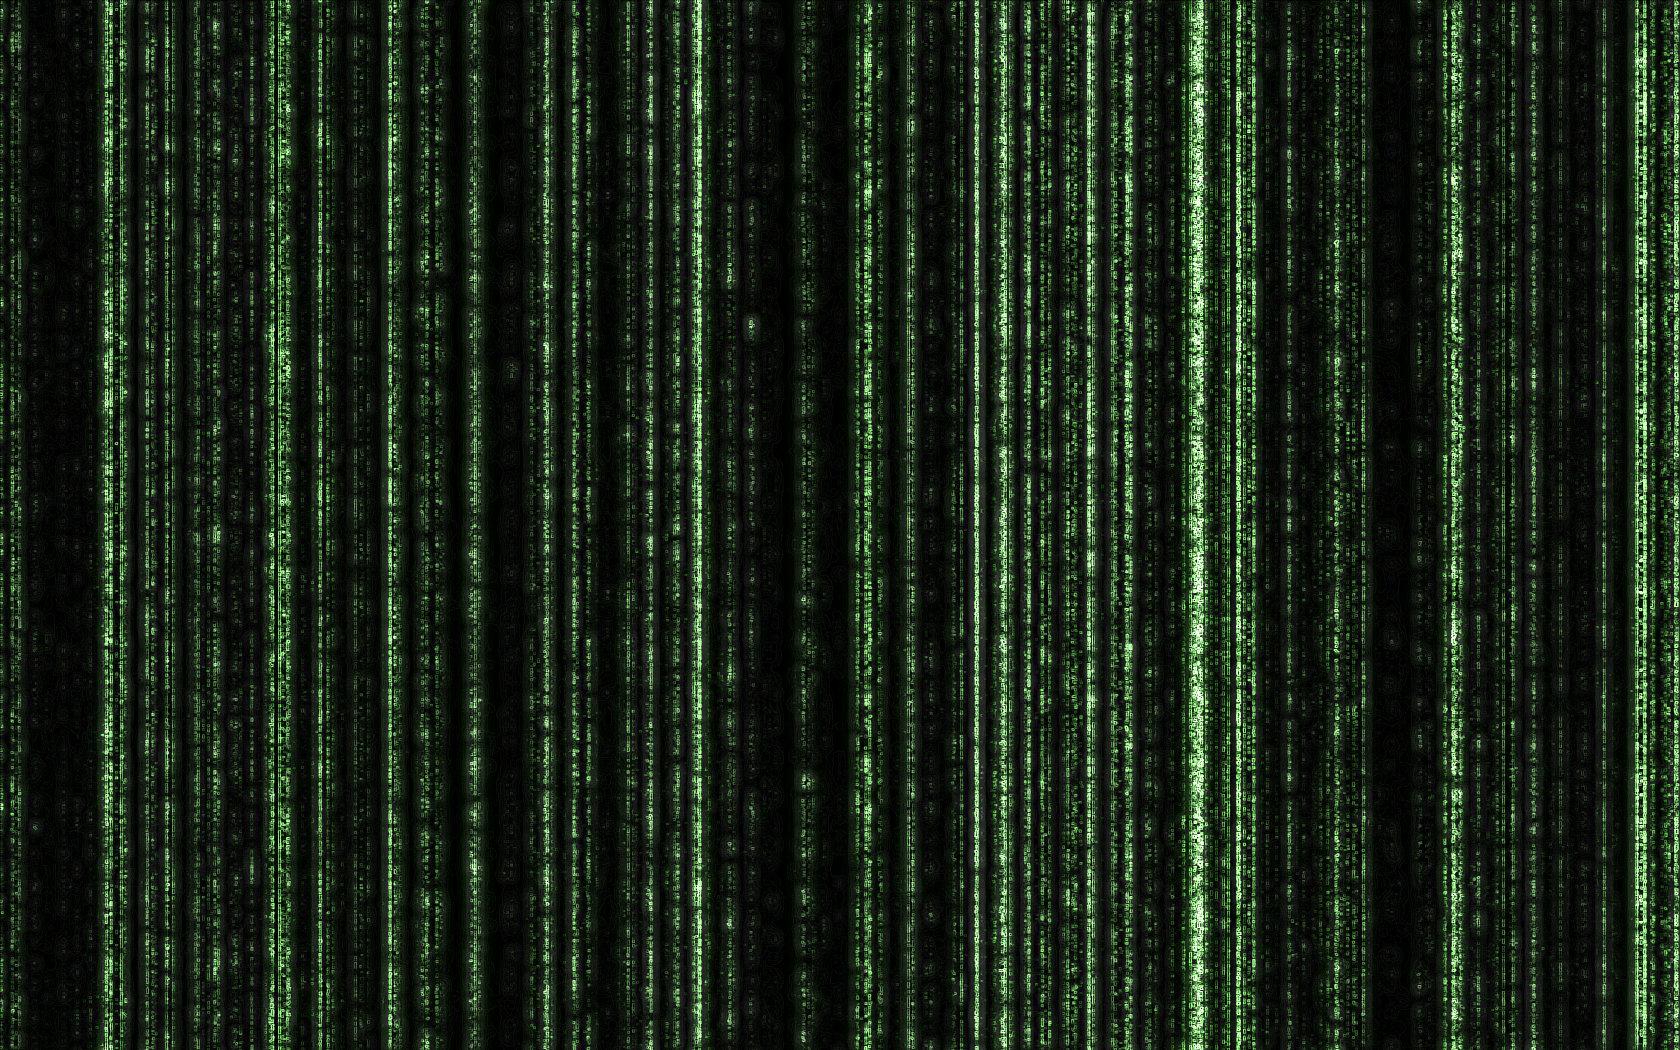 47 Live Matrix Hd Wallpaper On Wallpapersafari